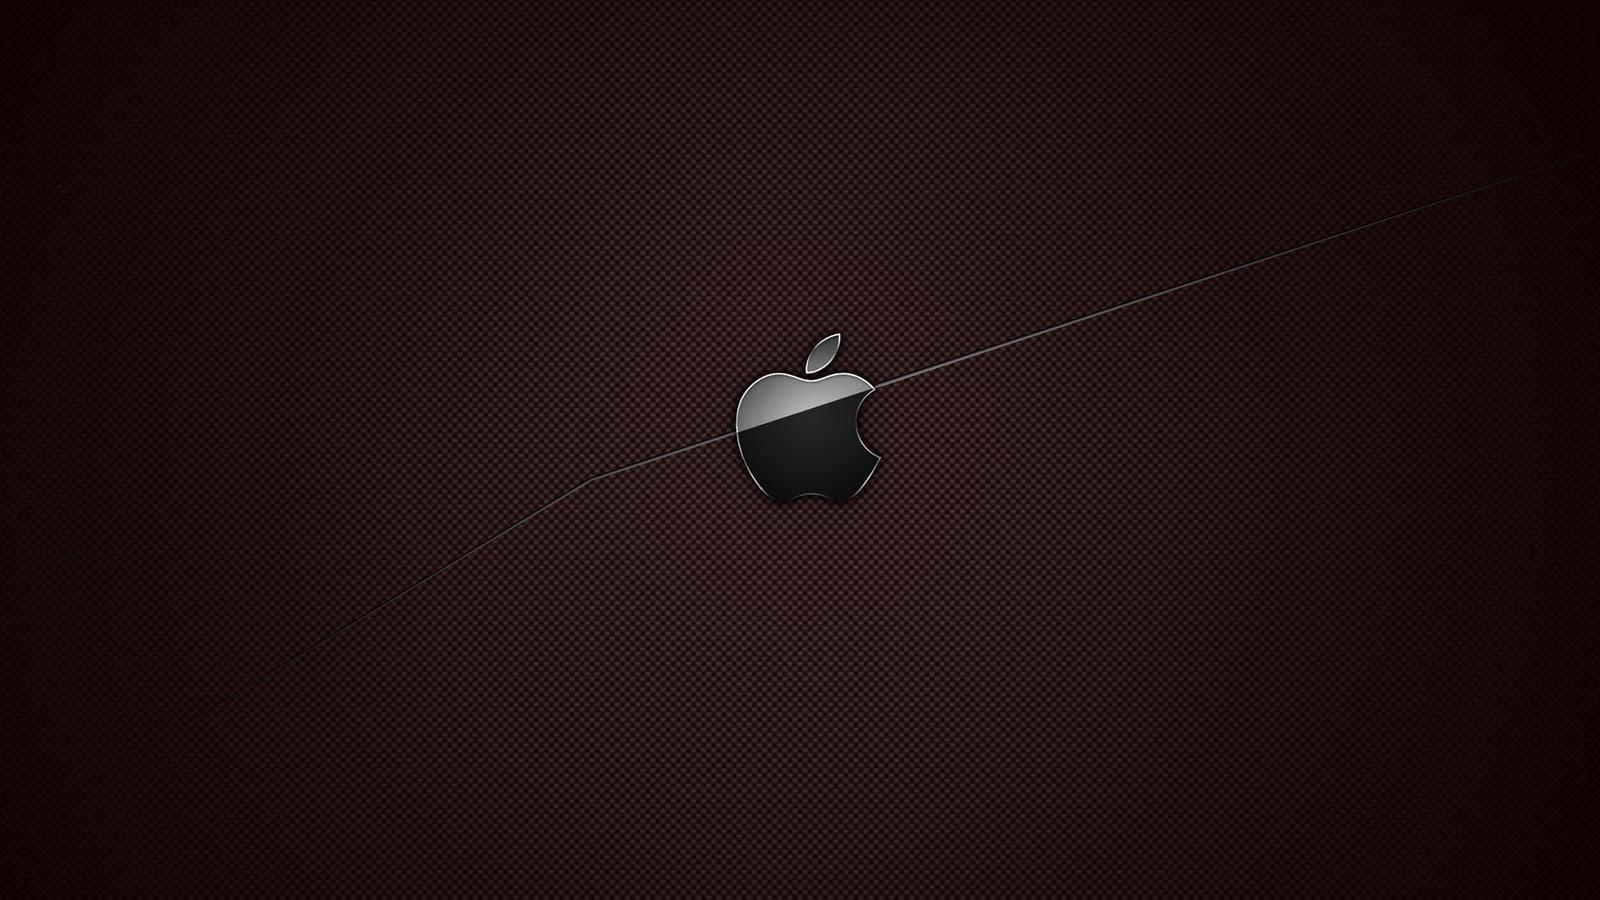 Animated Desktop Background